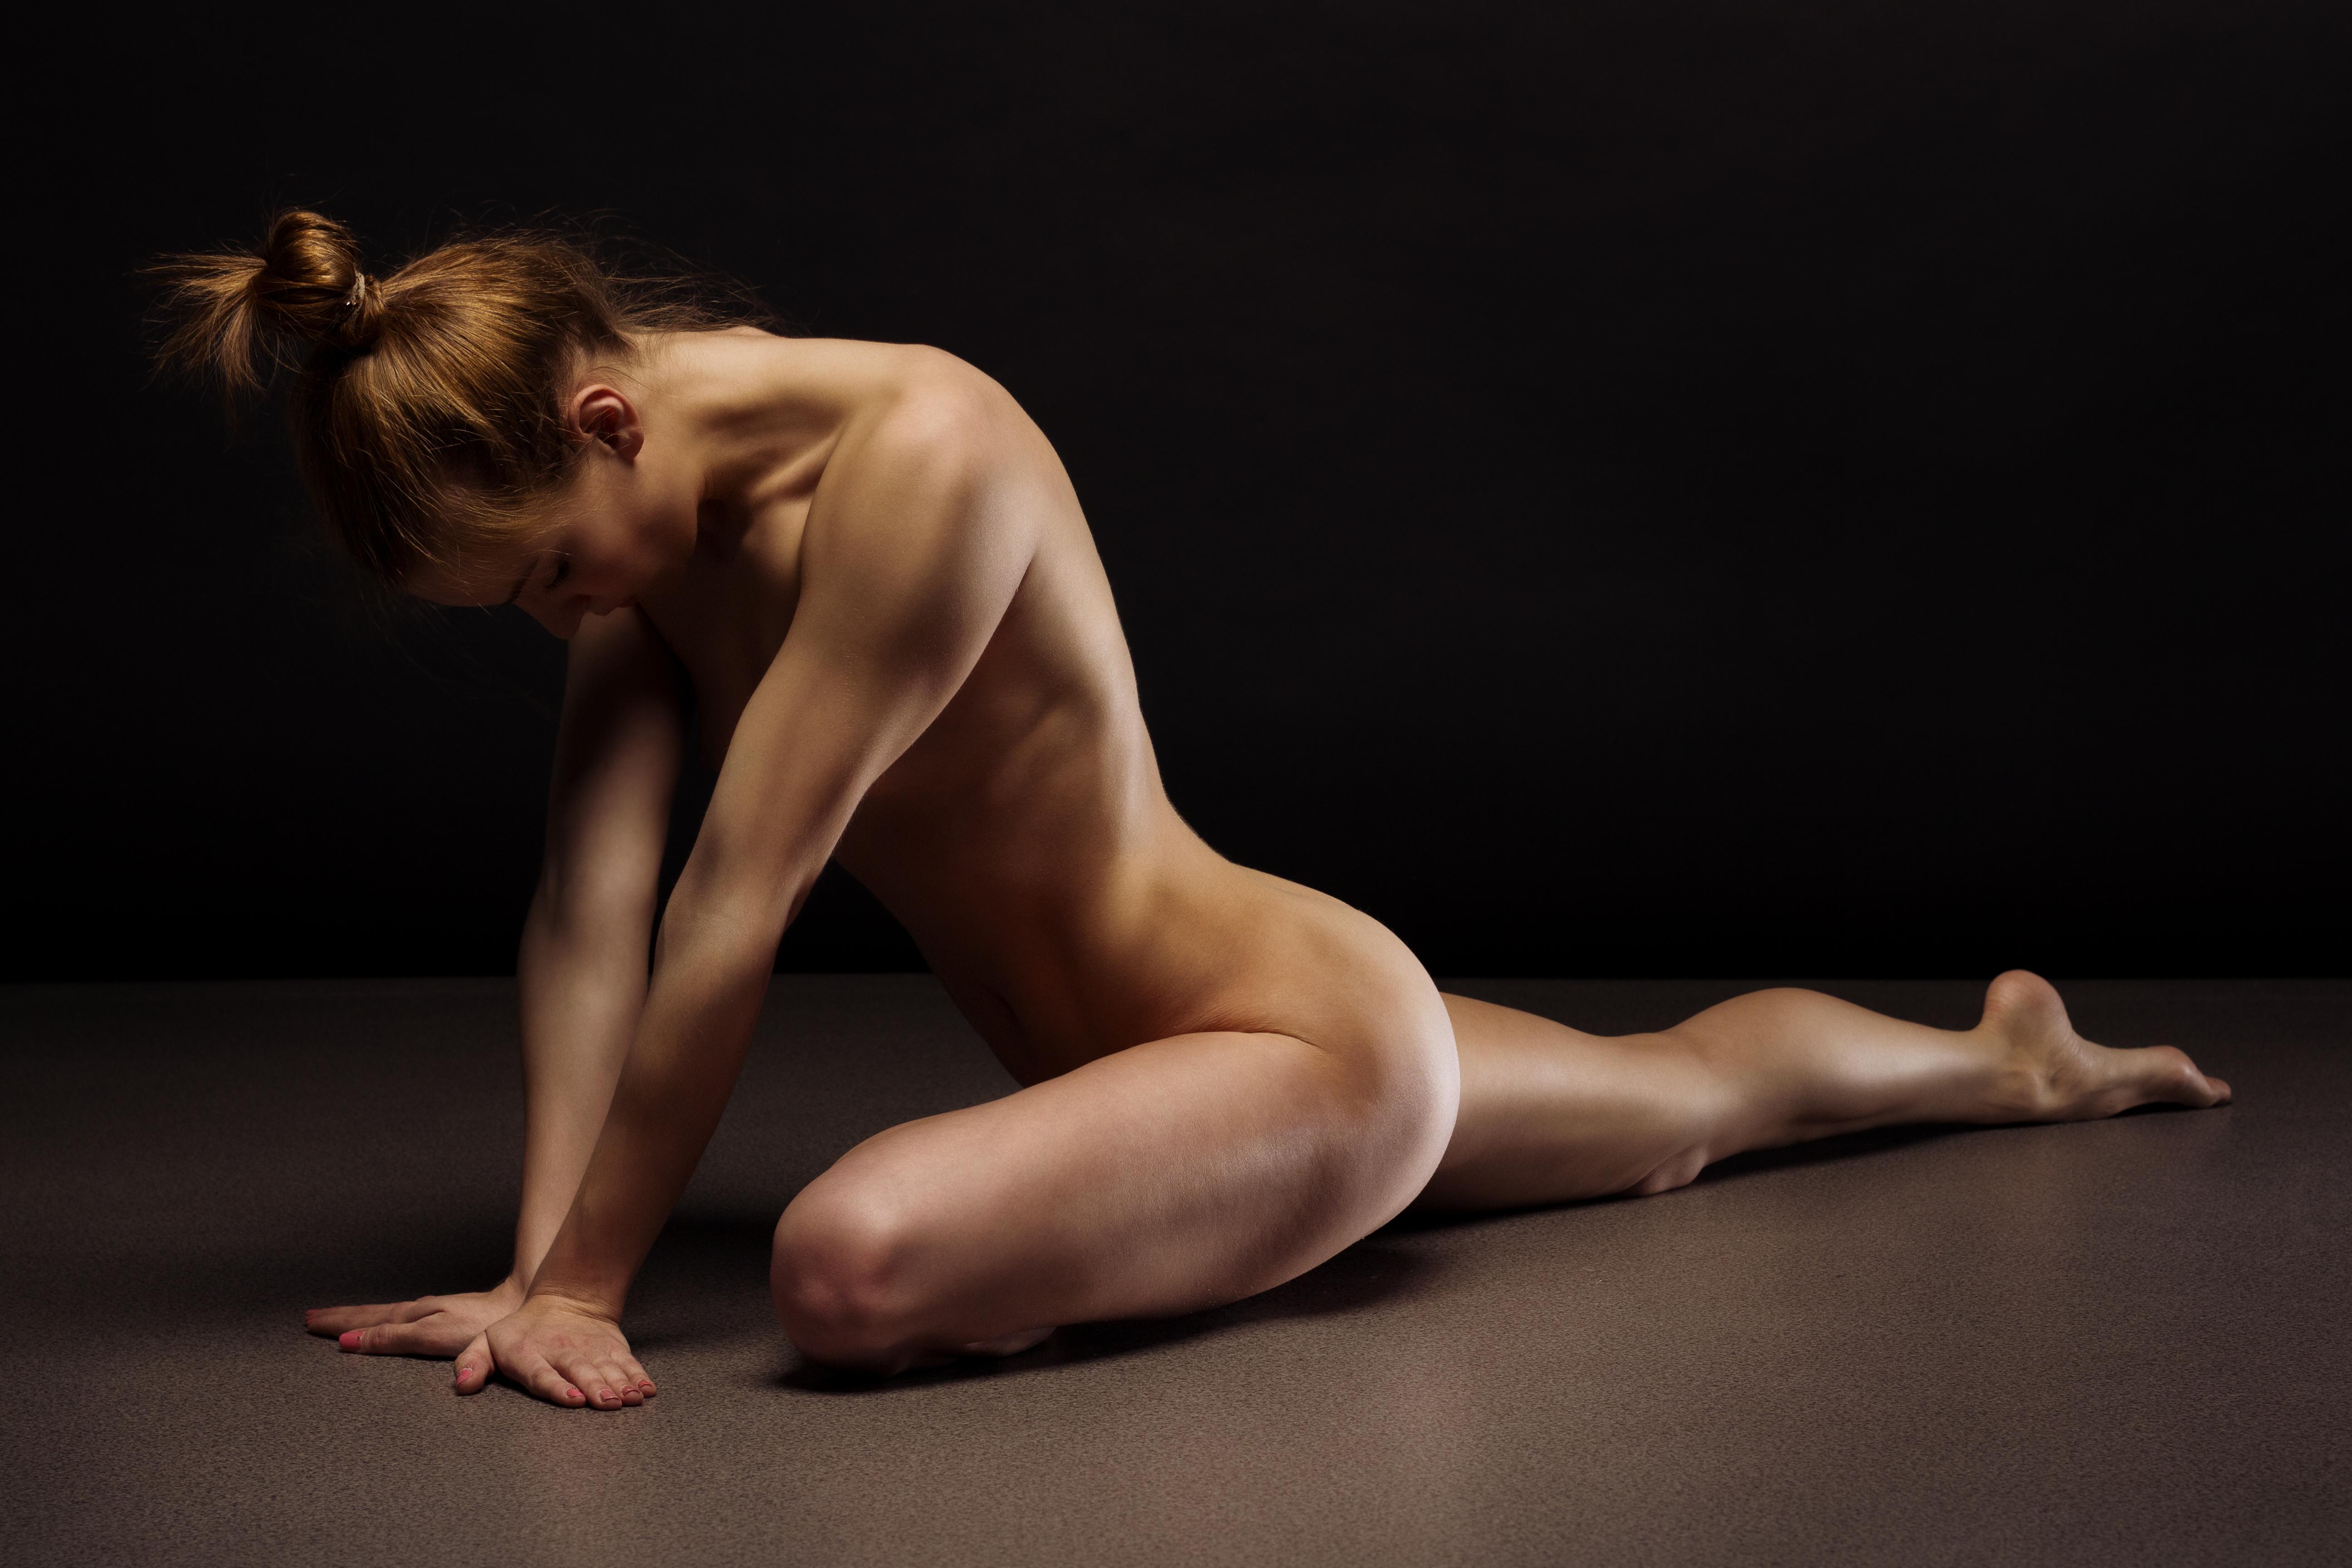 tantra massage helmond city girl